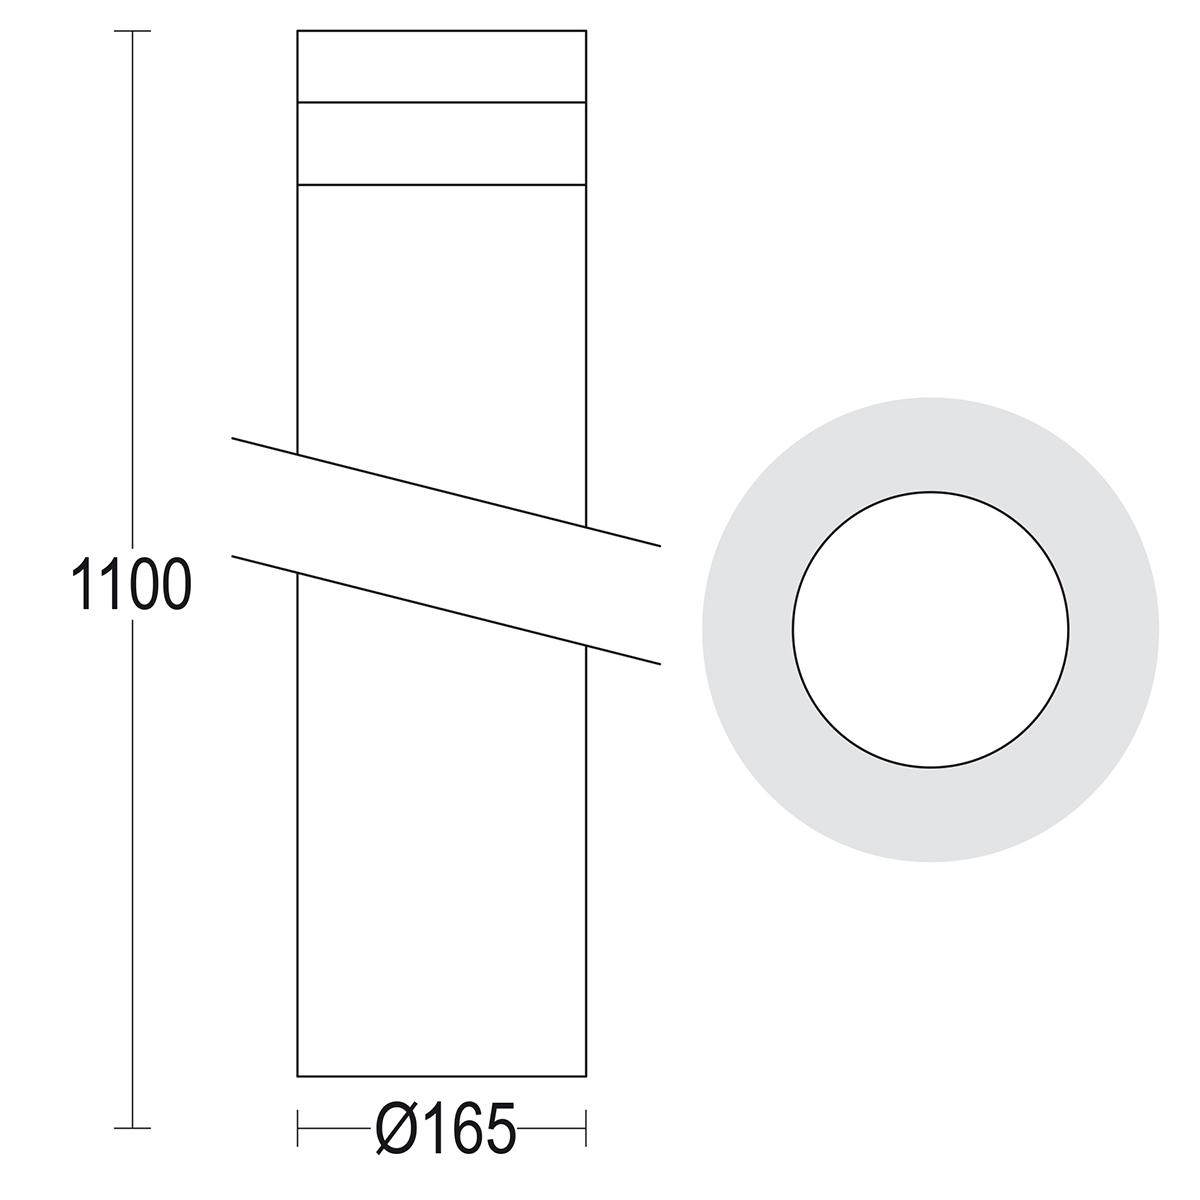 чертеж Maxitondo 1100 Ghidini уличный светильник GH1373.CGXT300EN